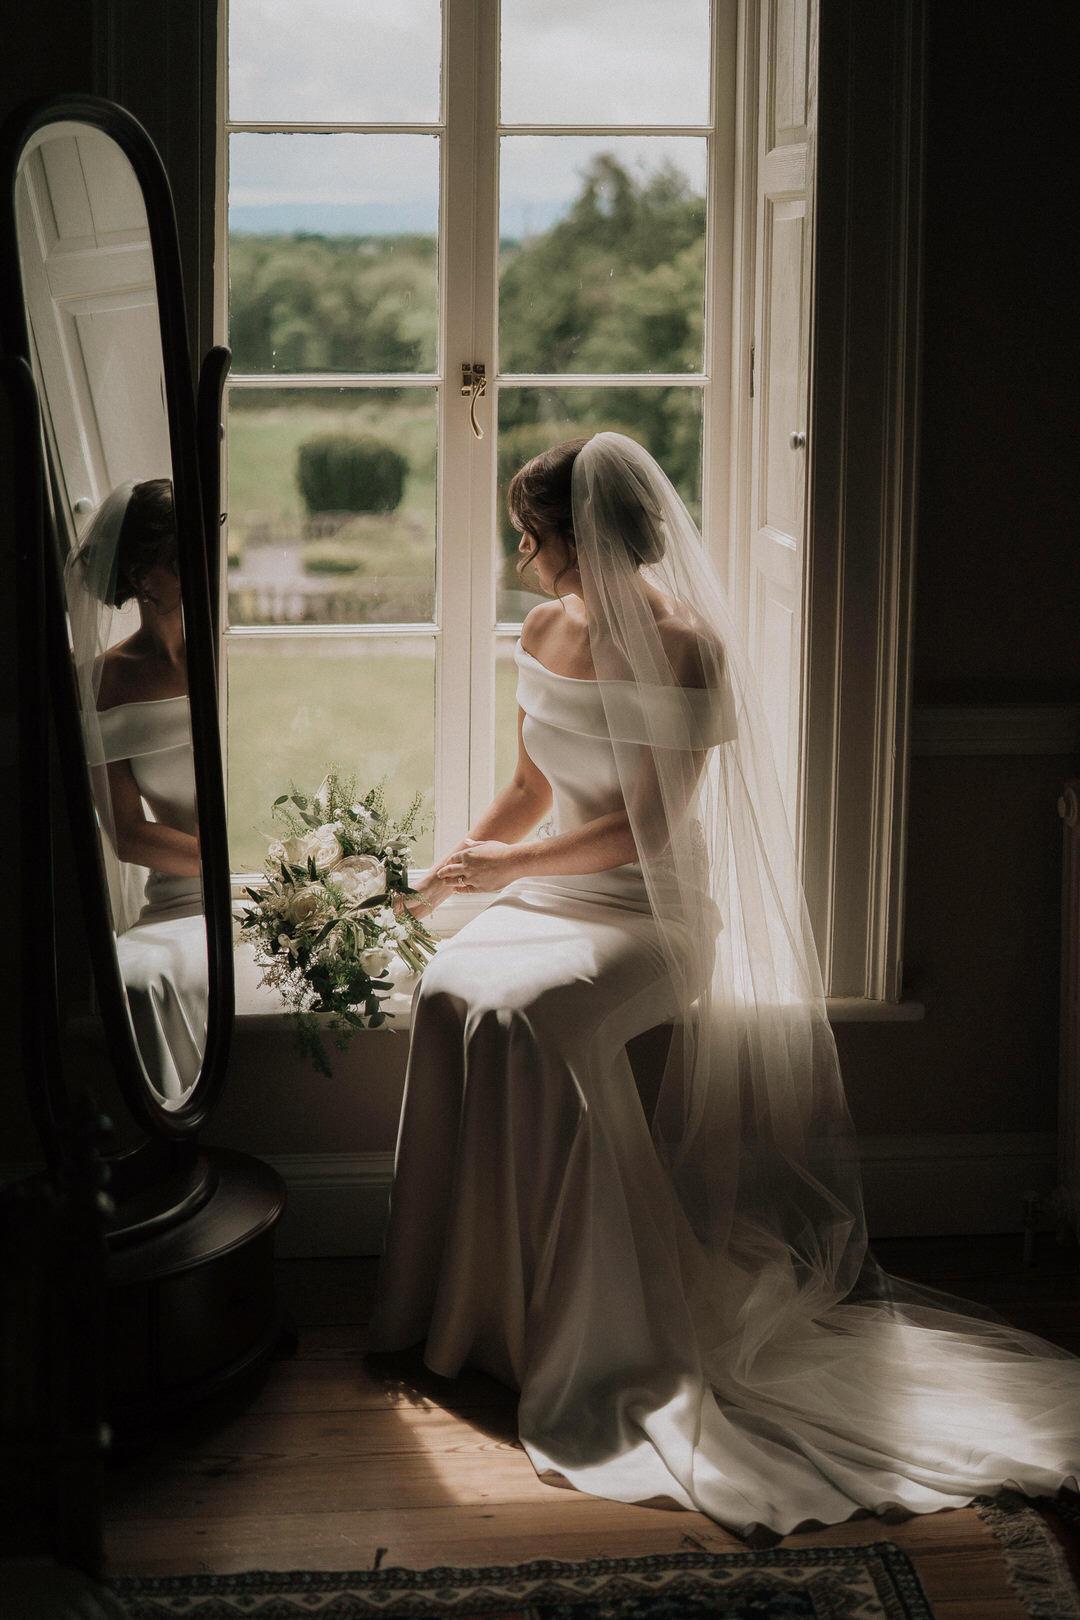 Gloster-House-wedding-photos2 2